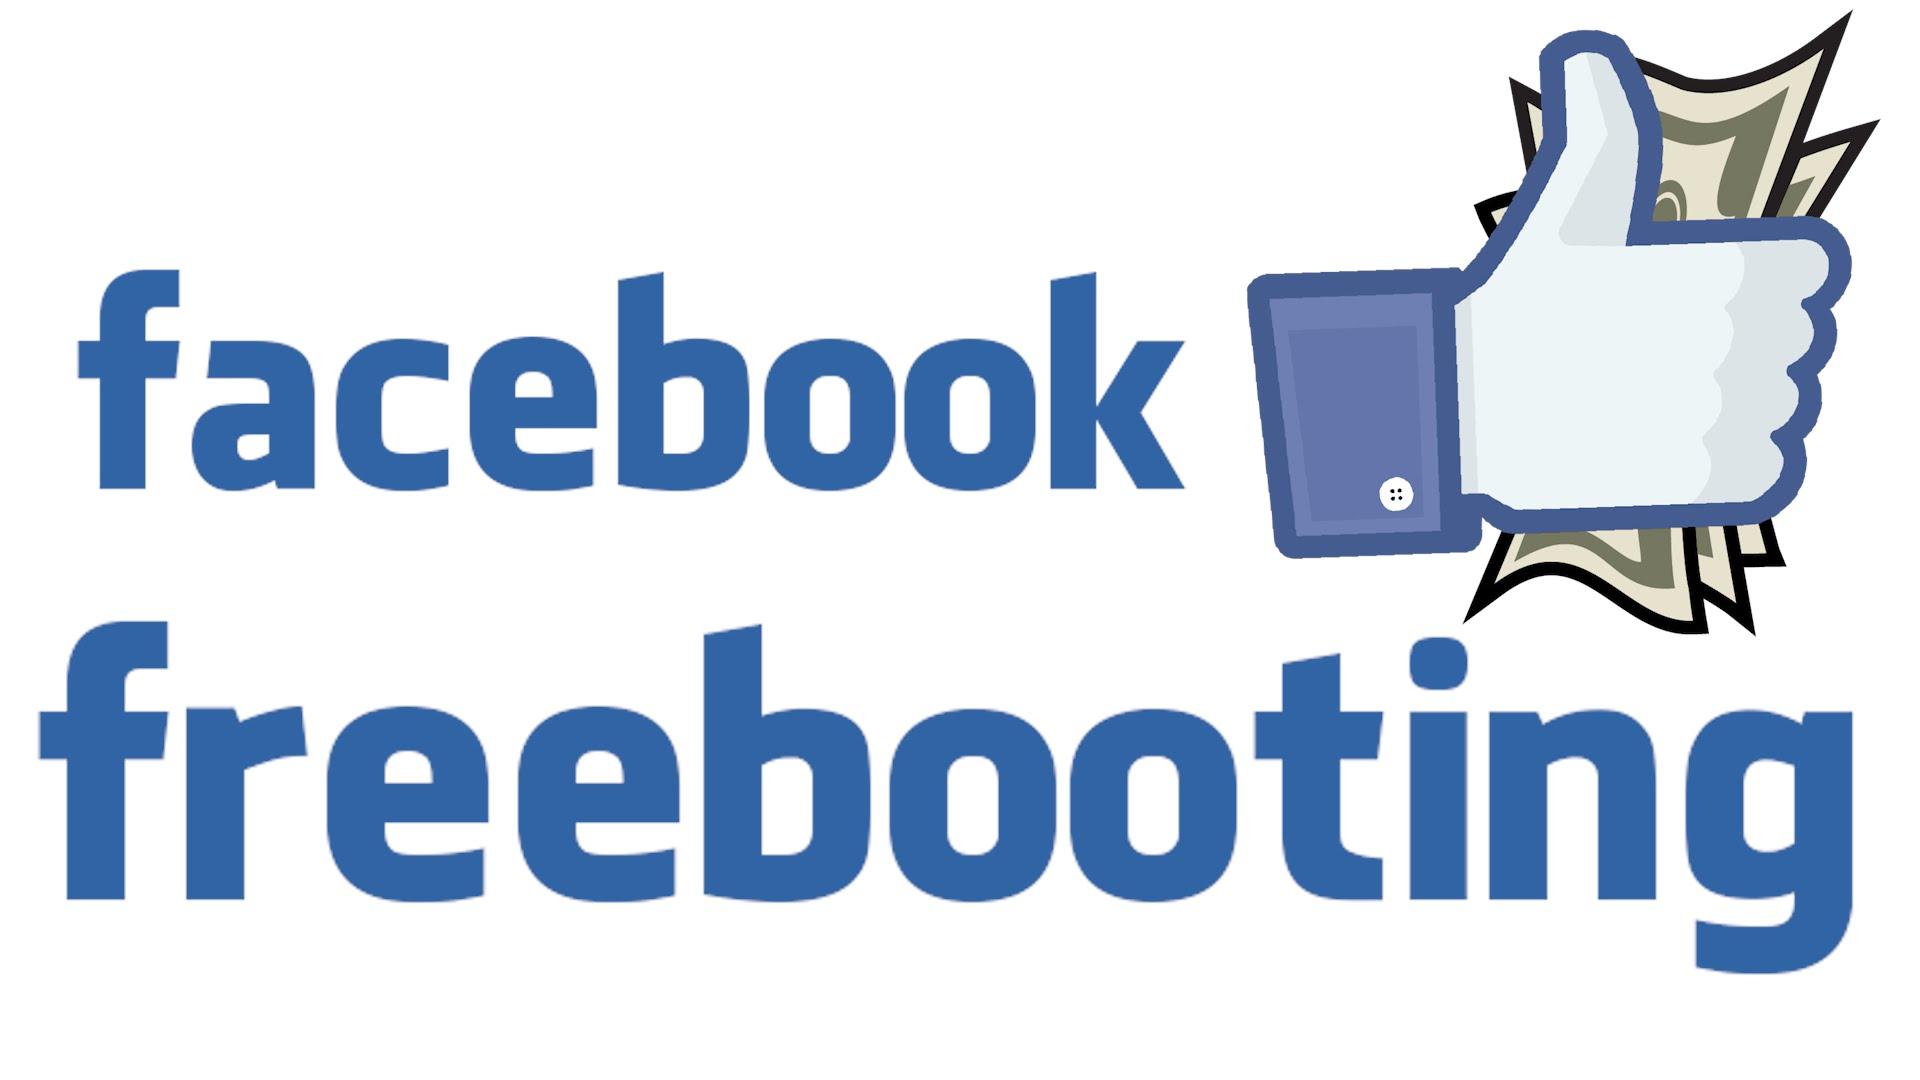 Facebook Videos: Freebooting and Facebook's Response